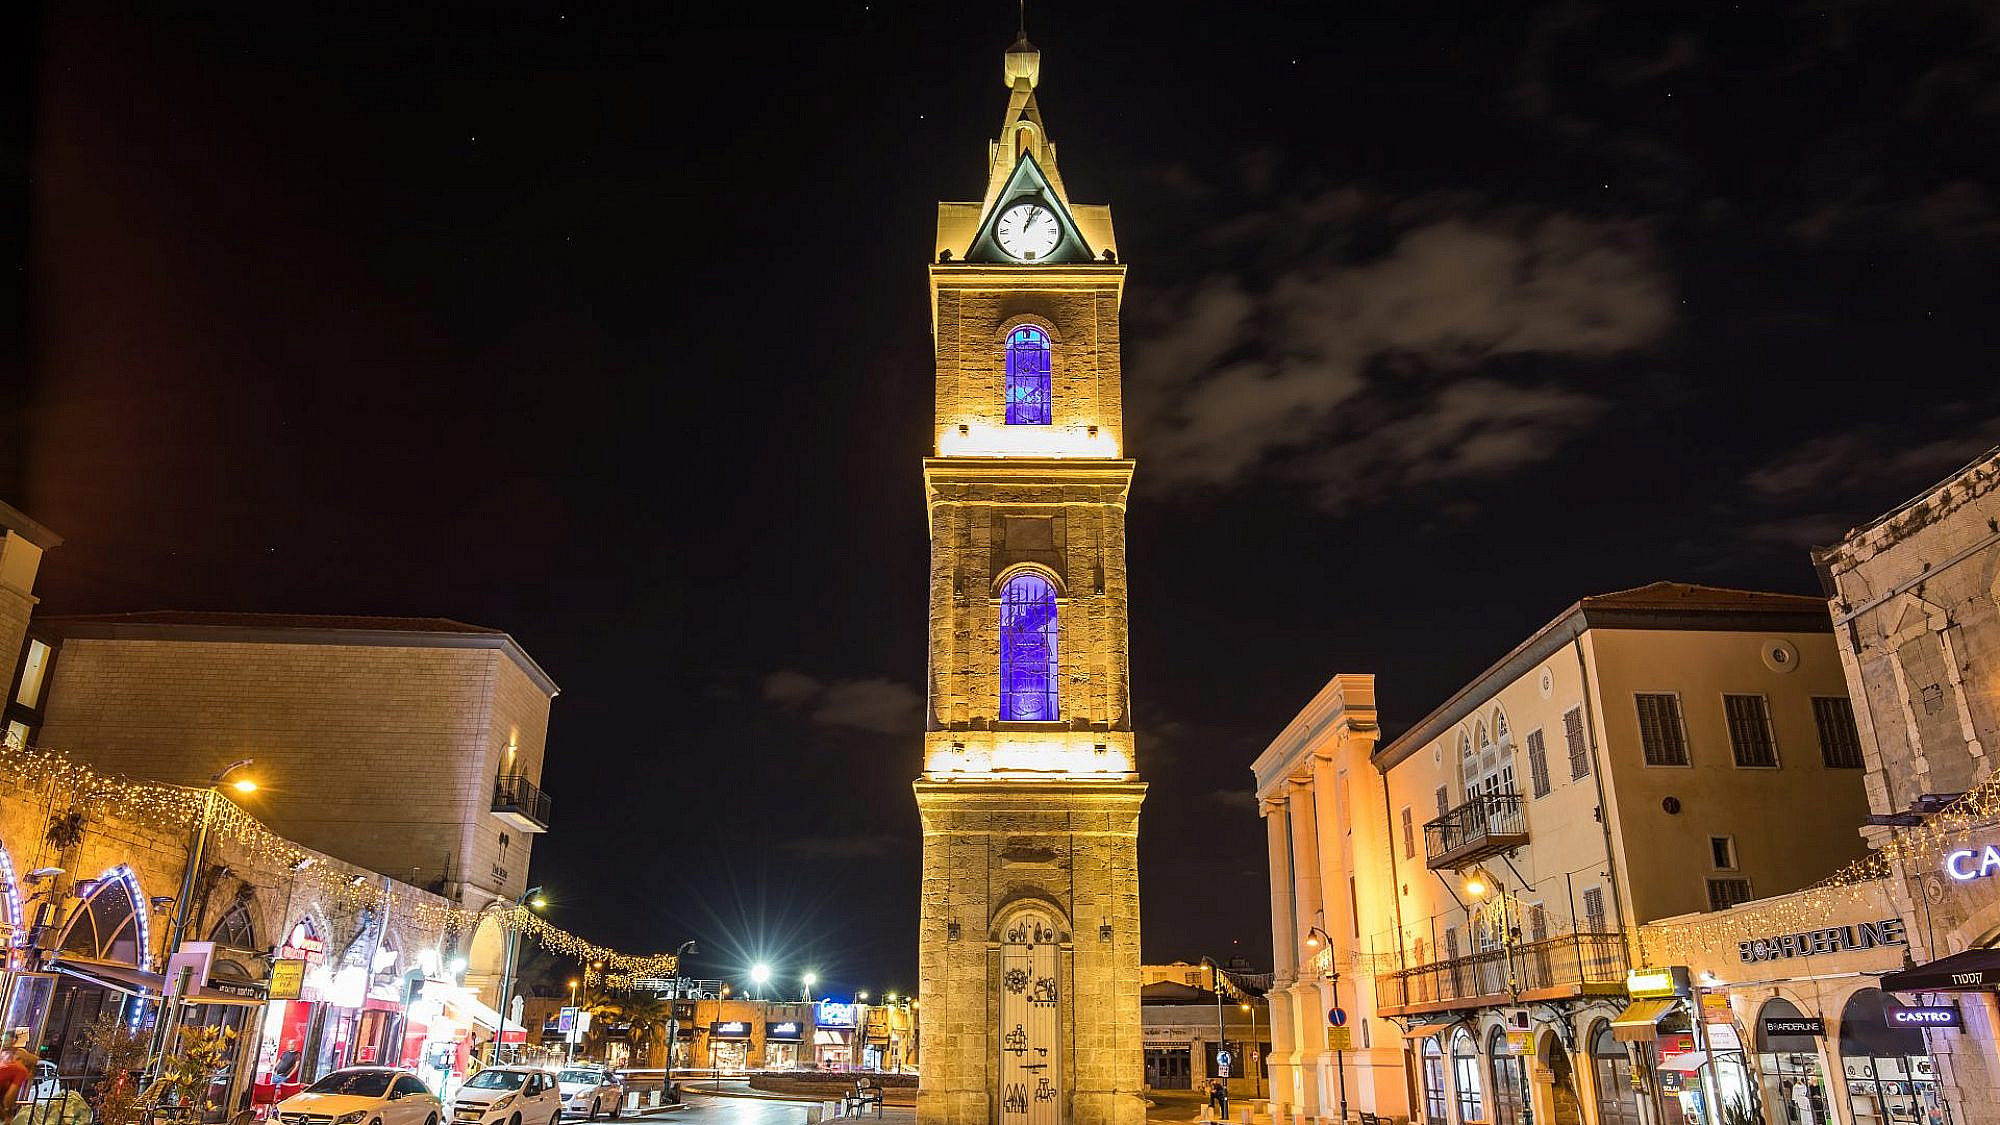 כיכר השעון ביפו. צילום: shutterstock